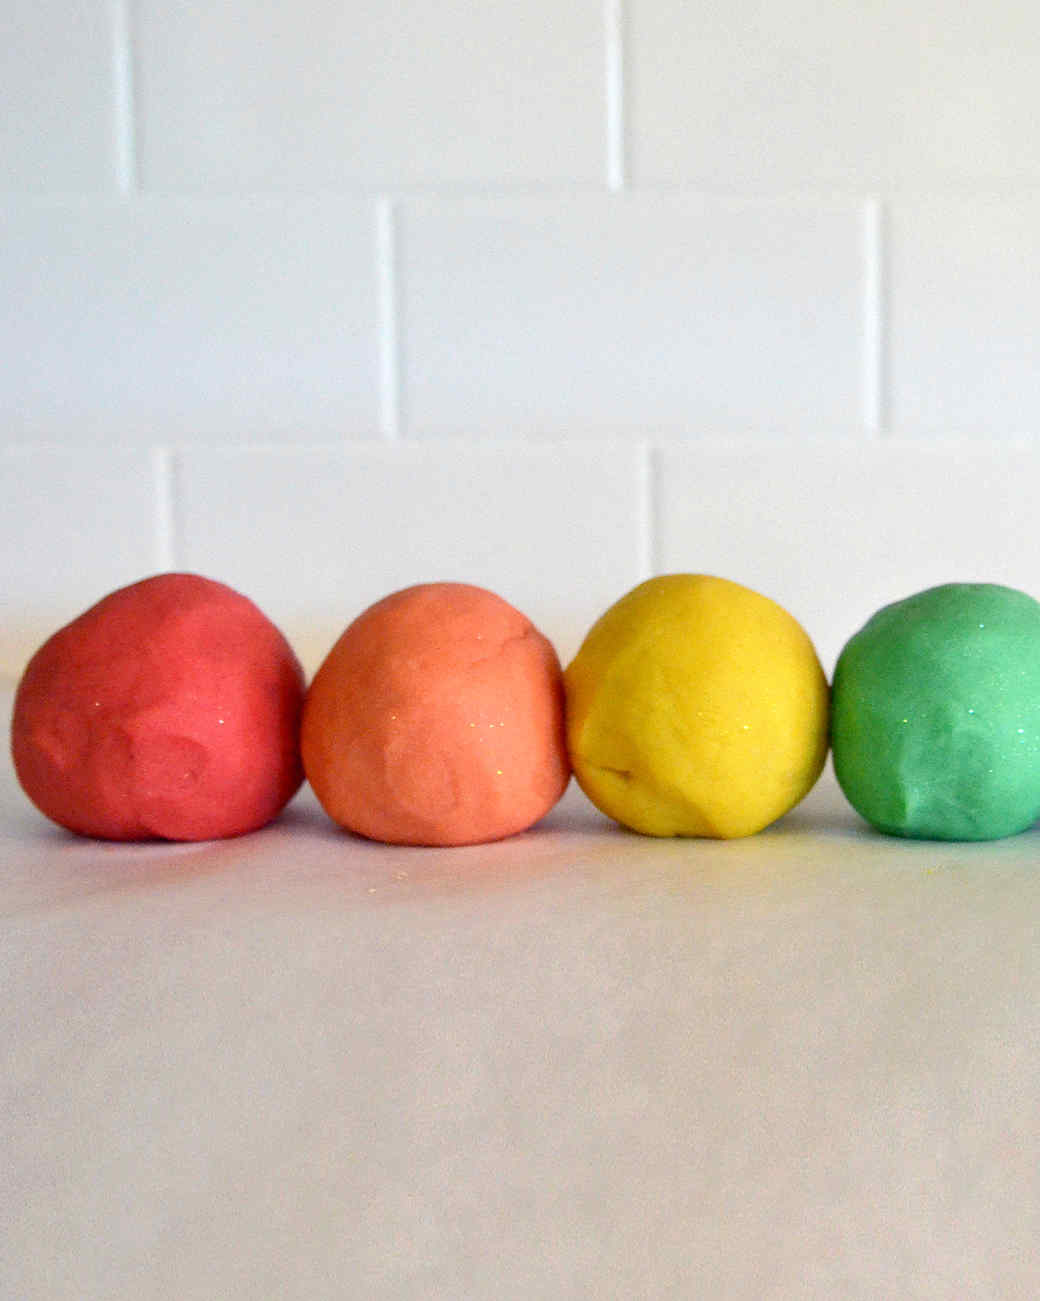 diy-play-dough-living-well-spending-less-001-0715.jpg